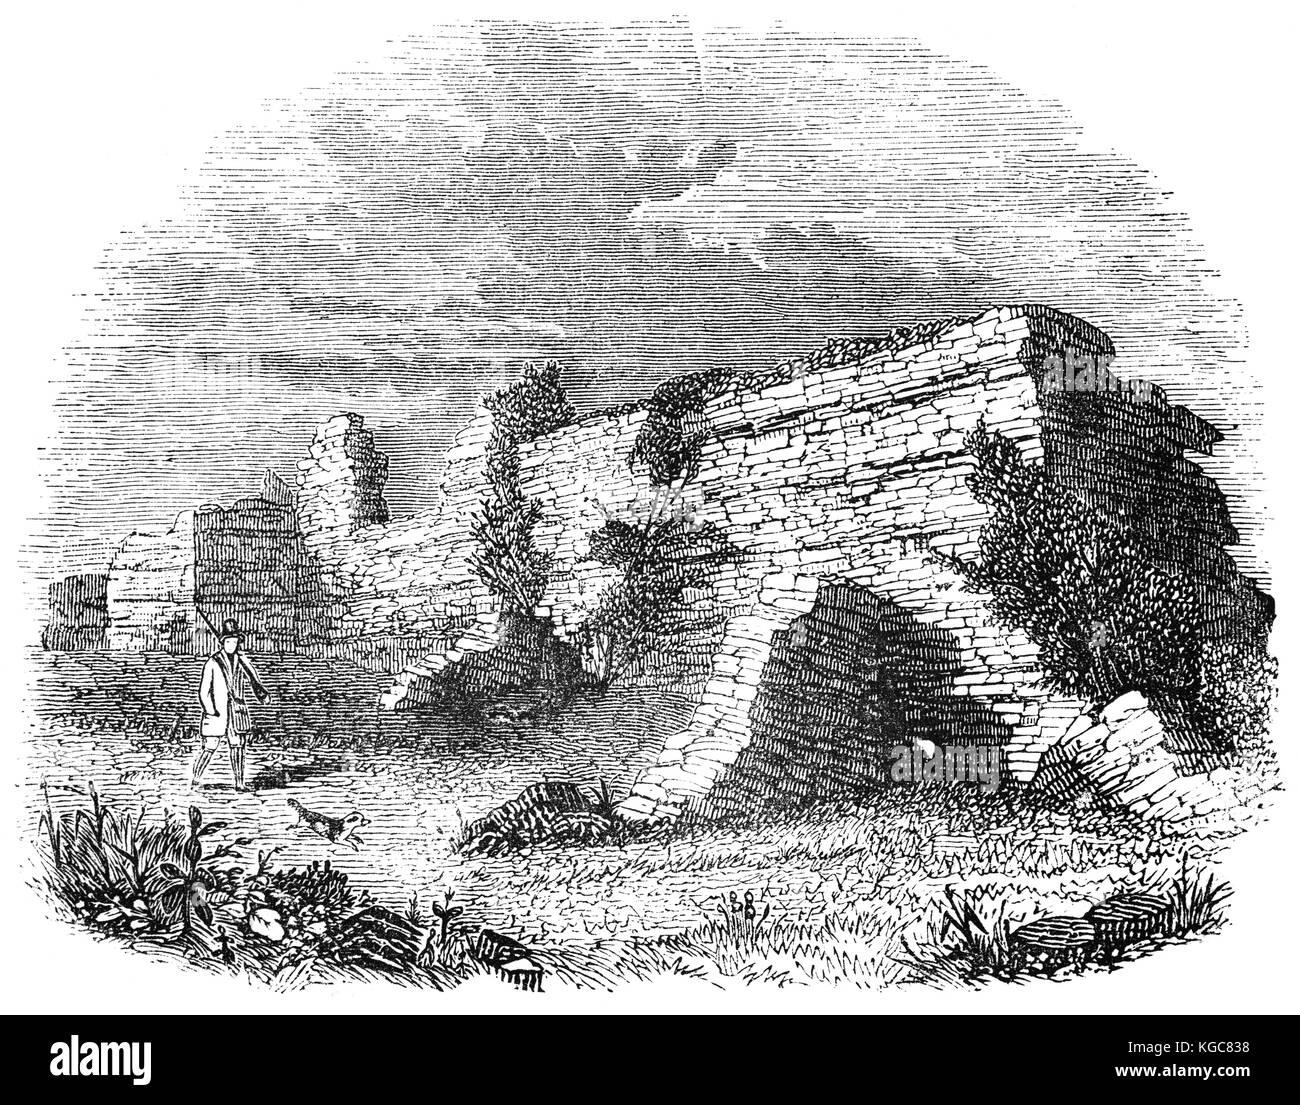 Huntsman and gun-dog passing the walled ruins of  Richborough Roman Fort, near Sandwich, Kent, England. Rutupiae - Stock Image